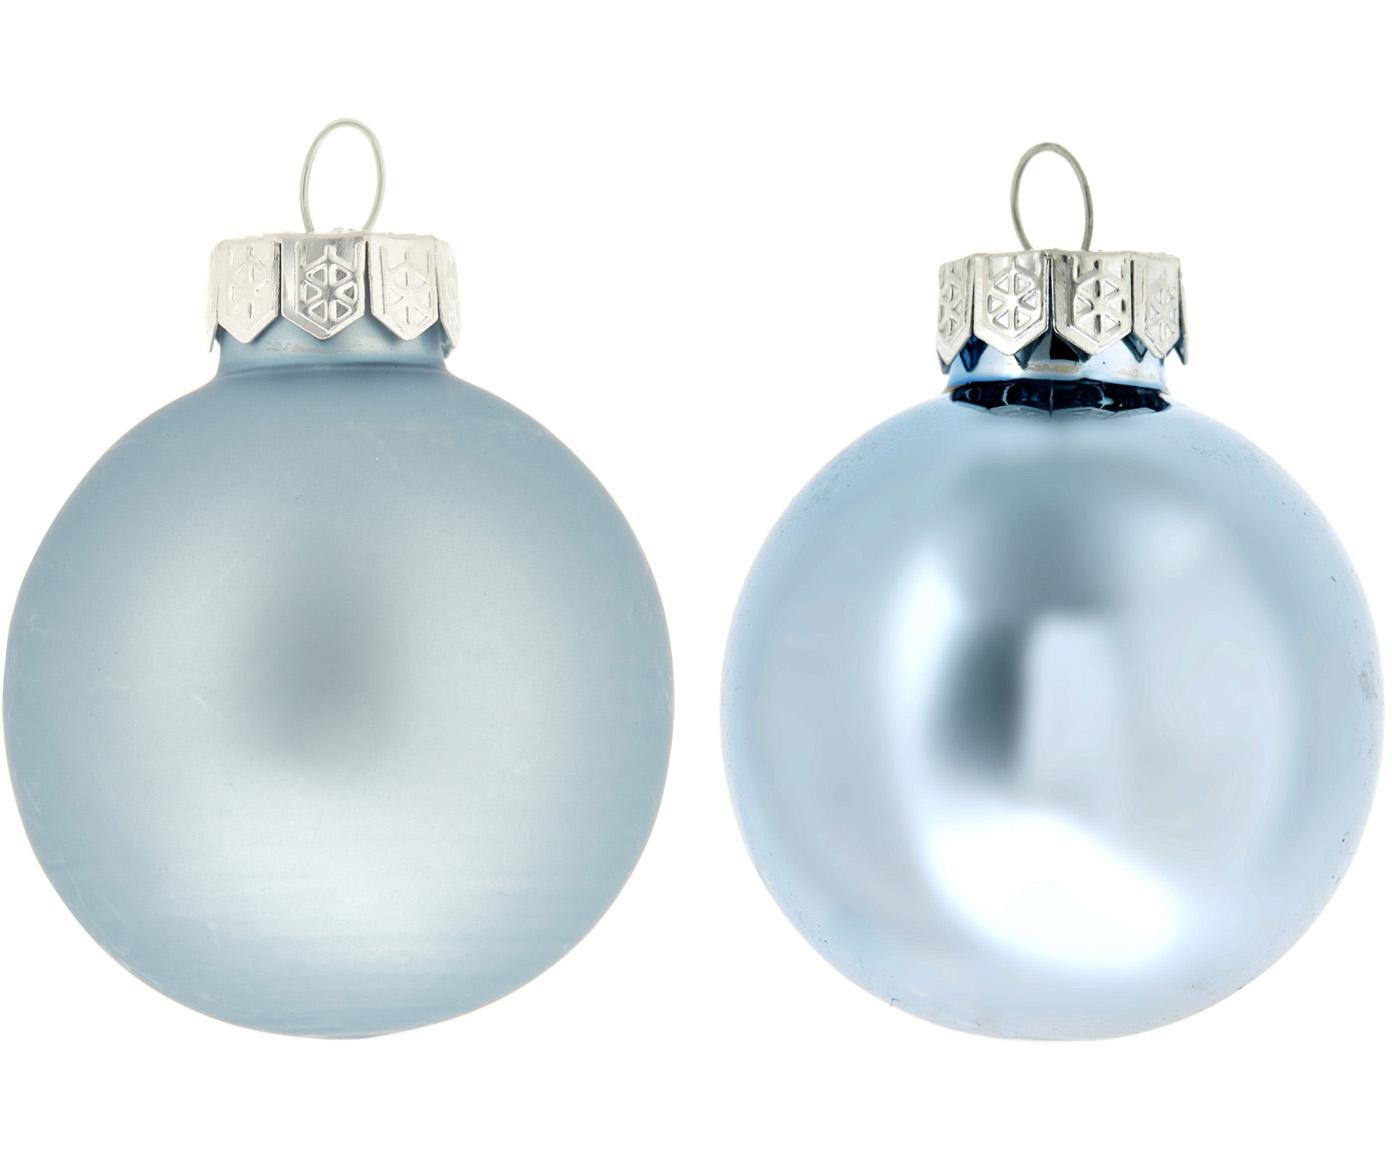 Mini-Weihnachtskugel-Set EvergreenØ4cm, 16-tlg., Eisblau, Ø 4 cm